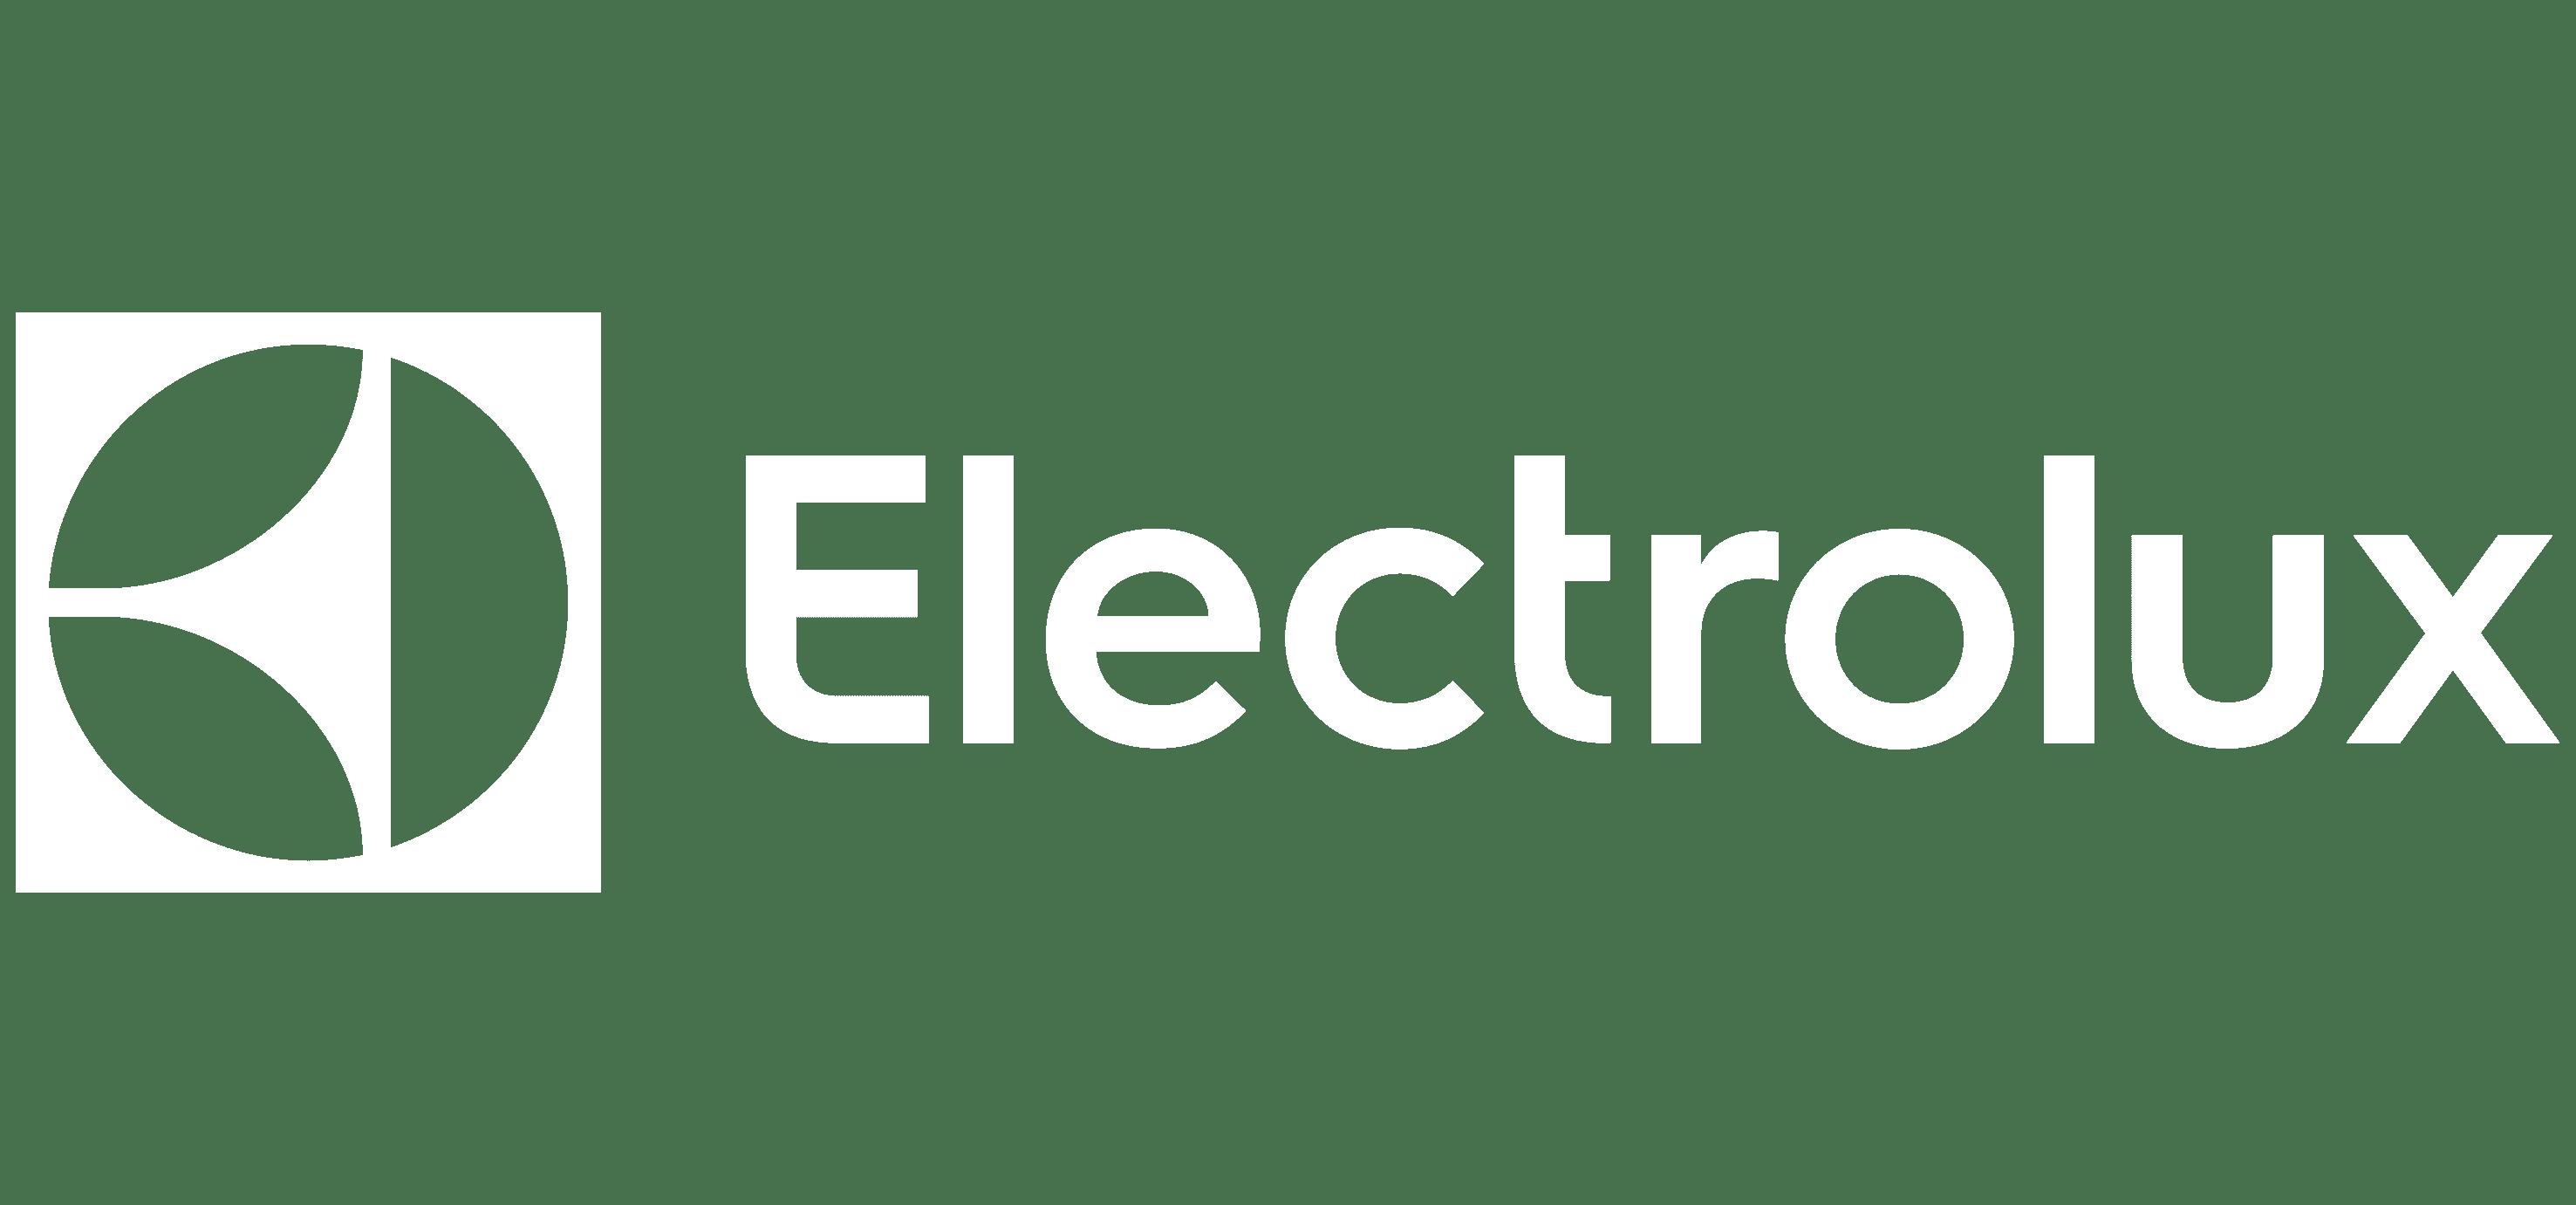 Formation programmatique - Electrolux